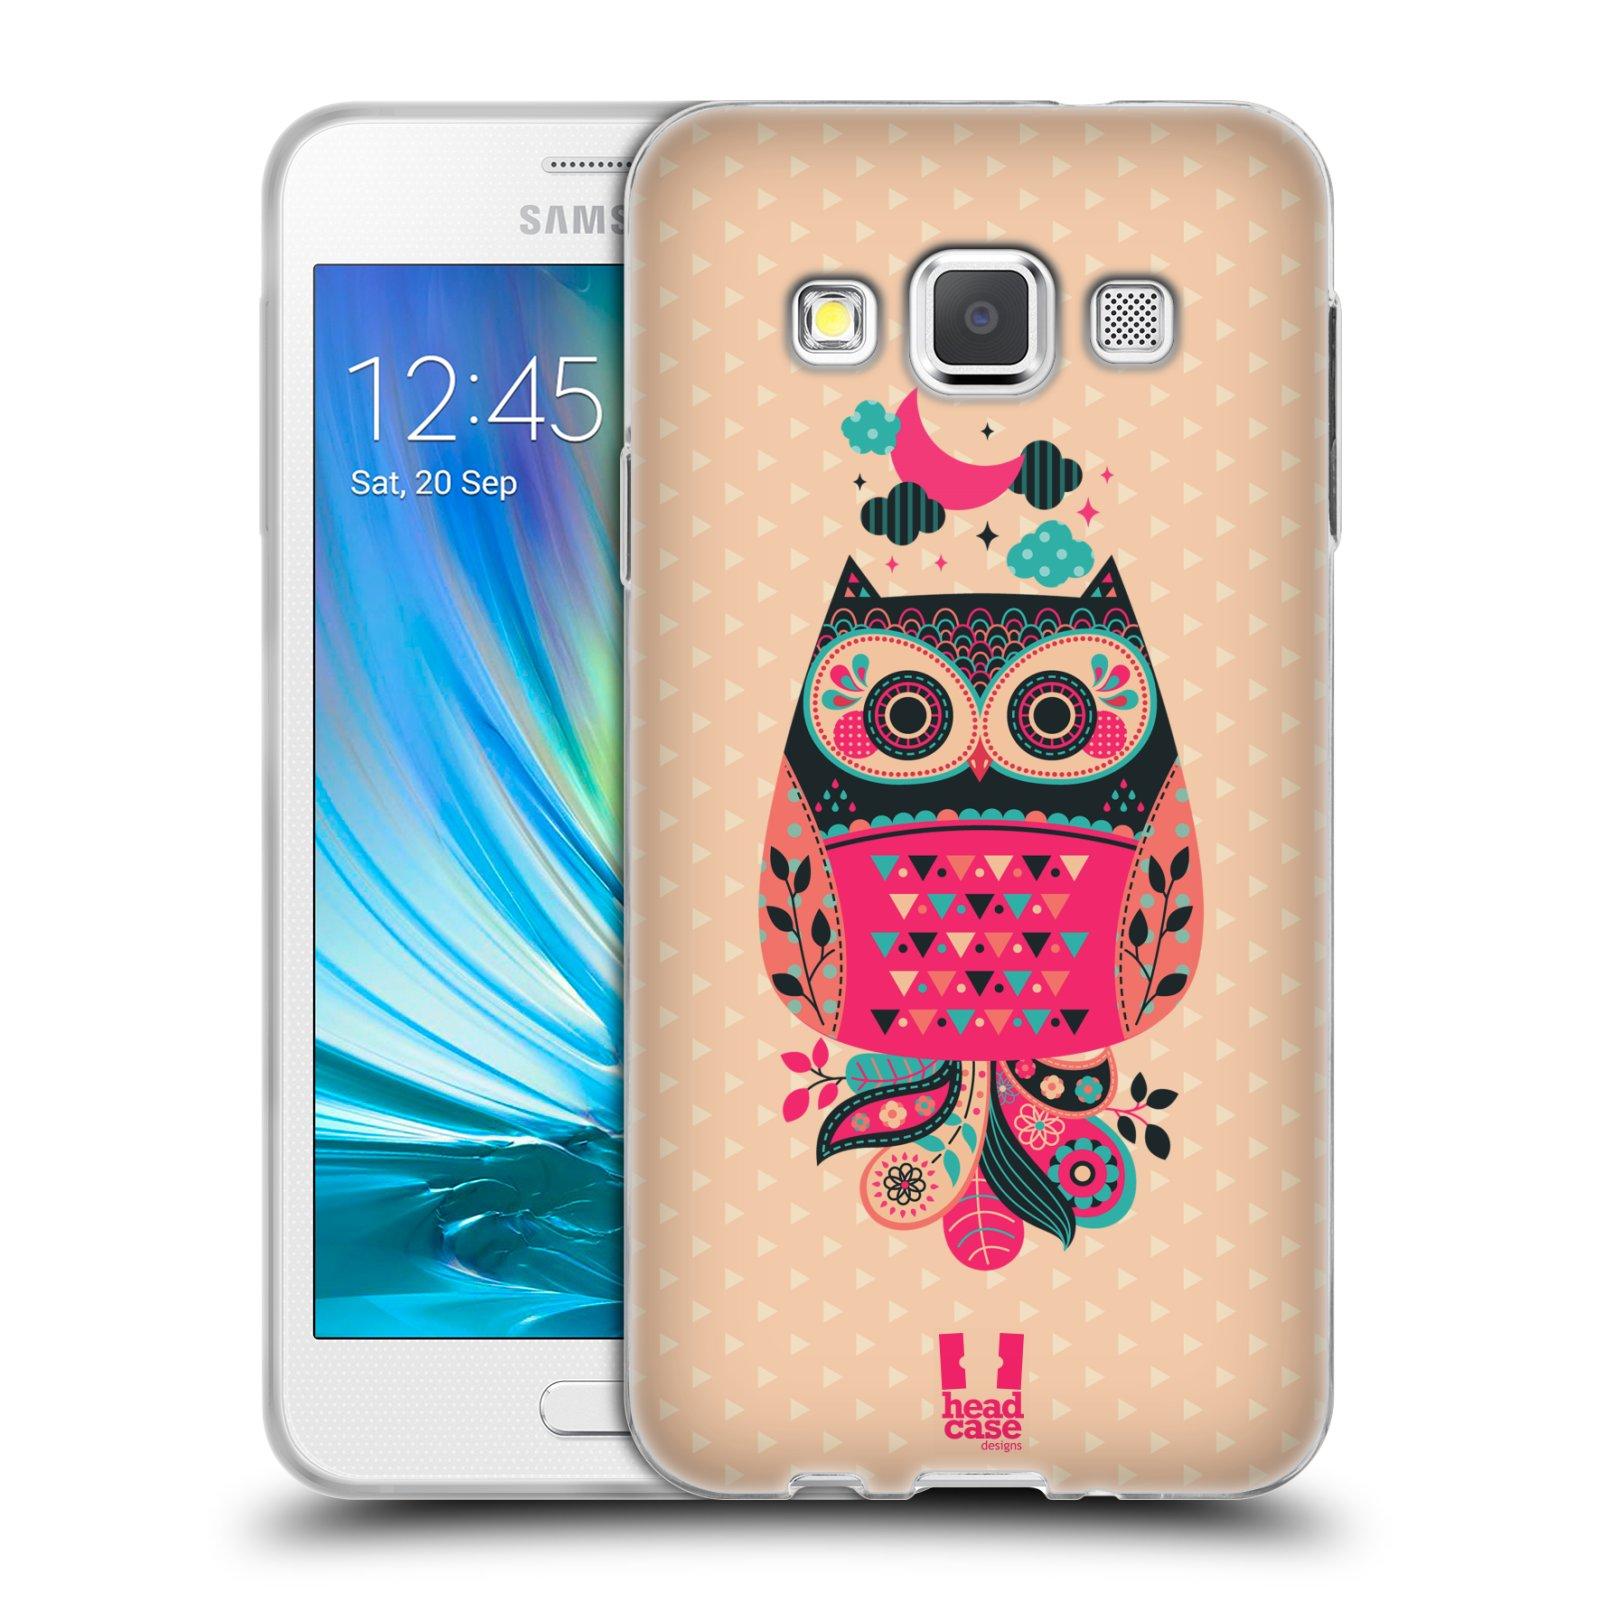 HEAD CASE silikonový obal na mobil Samsung Galaxy A3 vzor Stmívání sovička černá a korálová